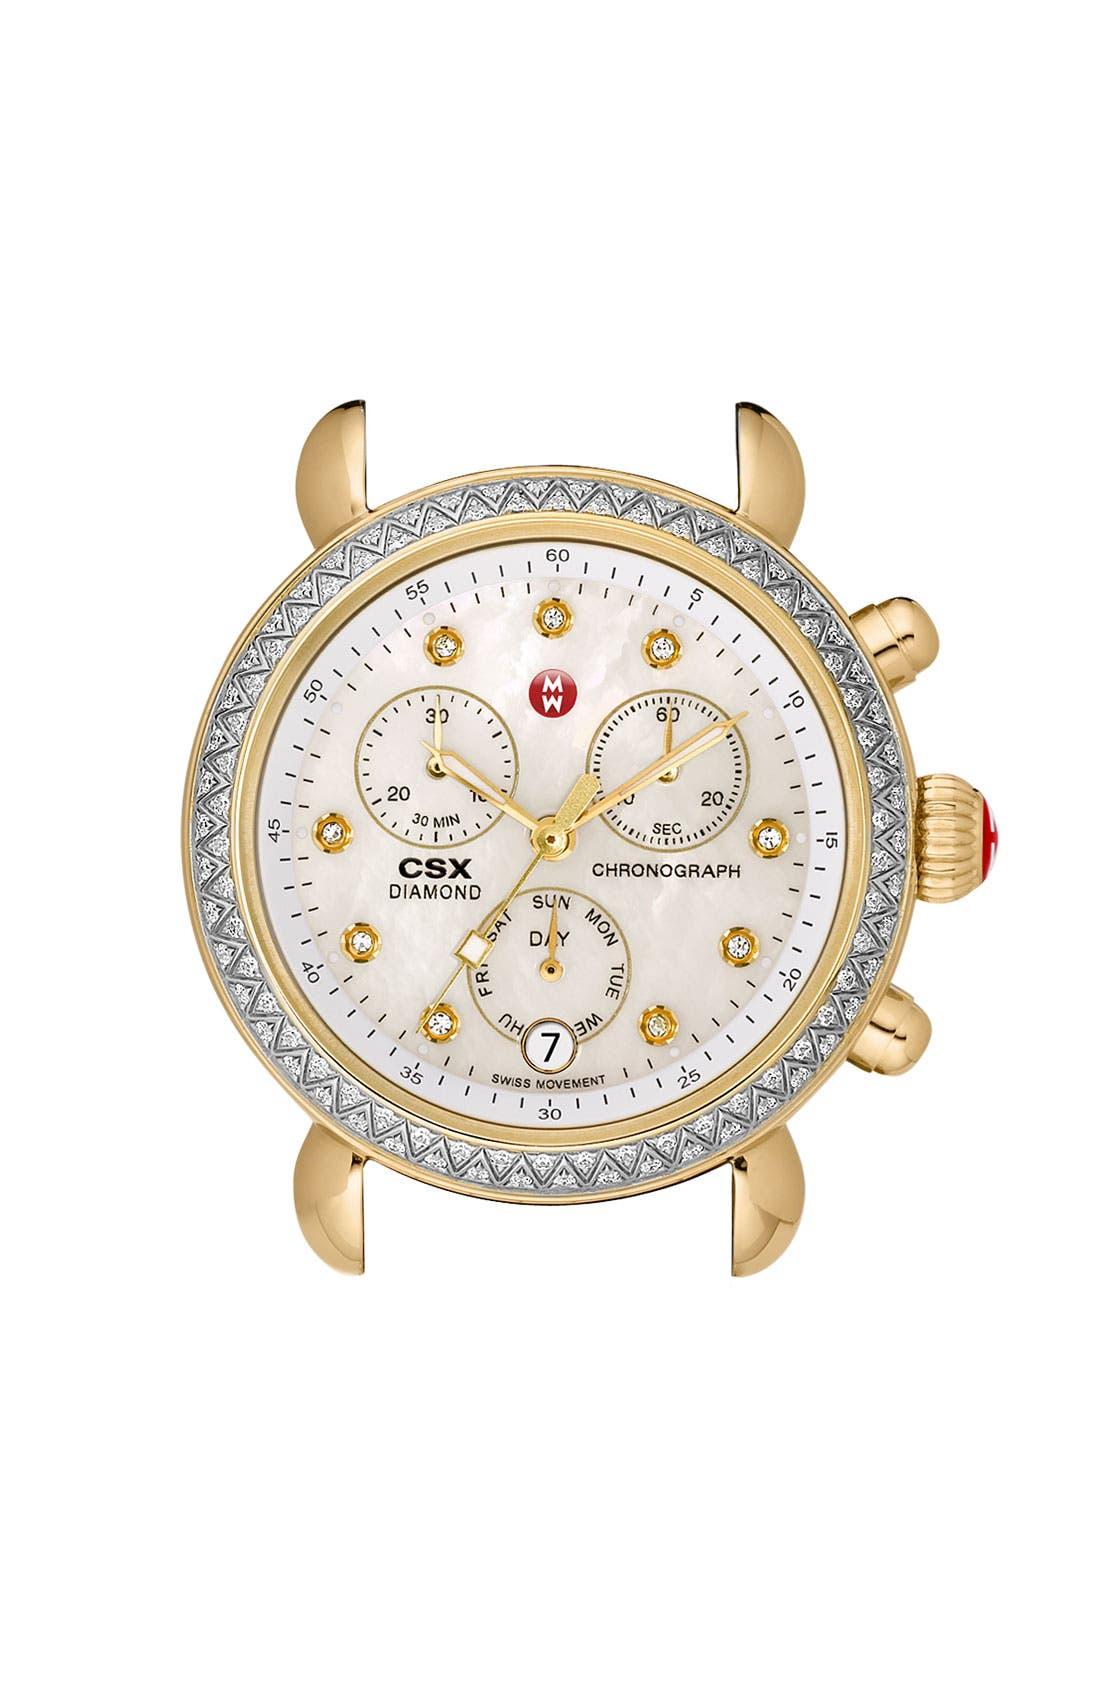 Alternate Image 1 Selected - MICHELE 'CSX-36 Diamond' Diamond Dial Two Tone Watch Case, 36mm